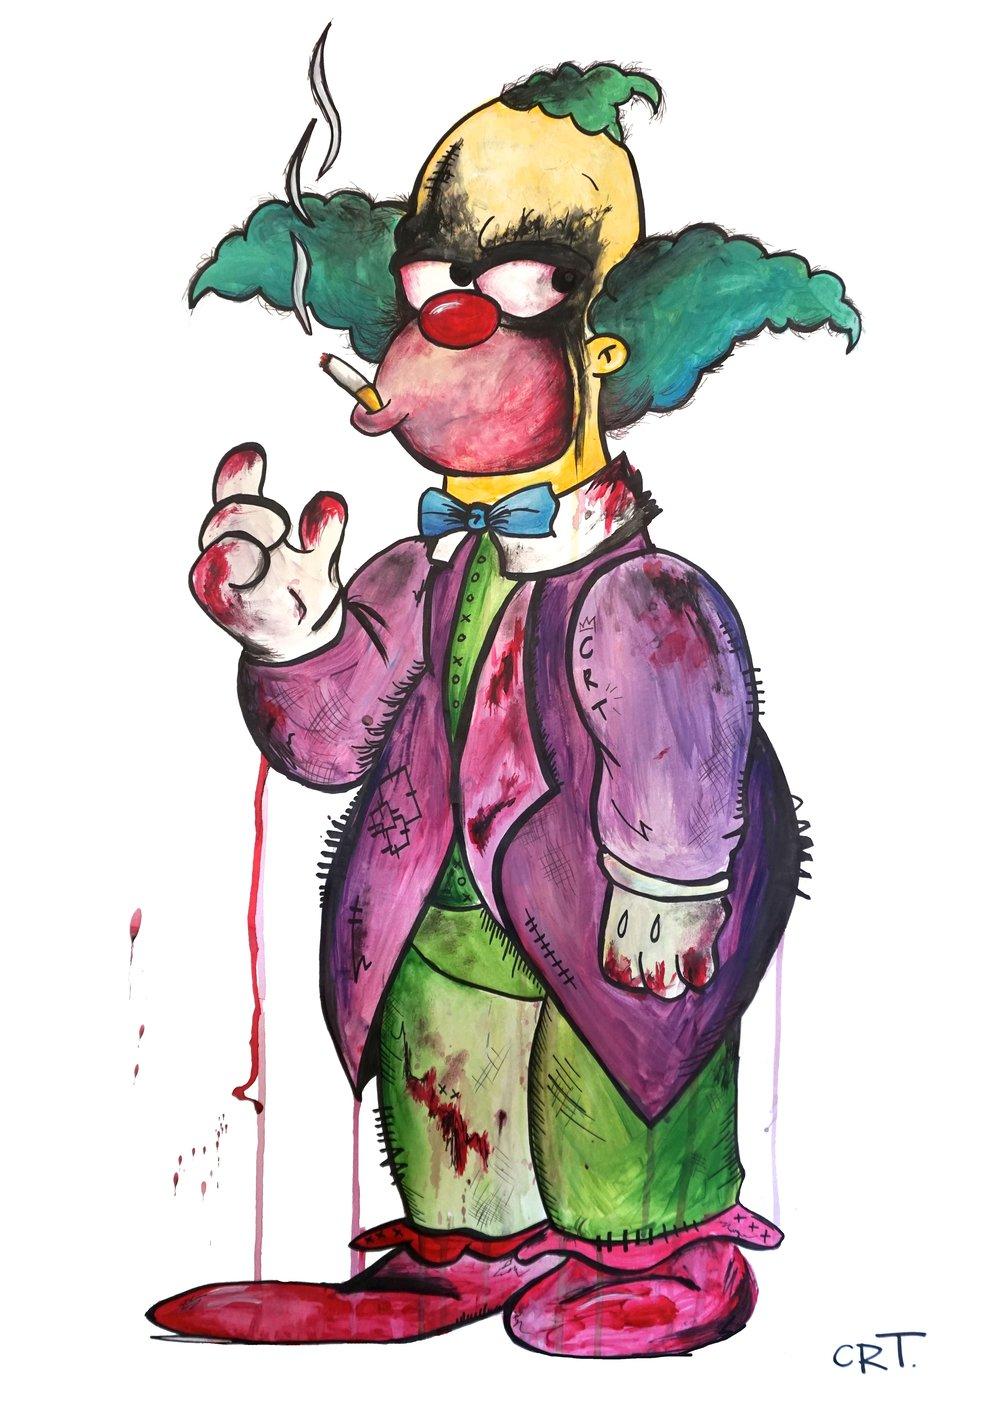 Krusty the Joker  58cm x 83cm Acrylic on Paper  Sold